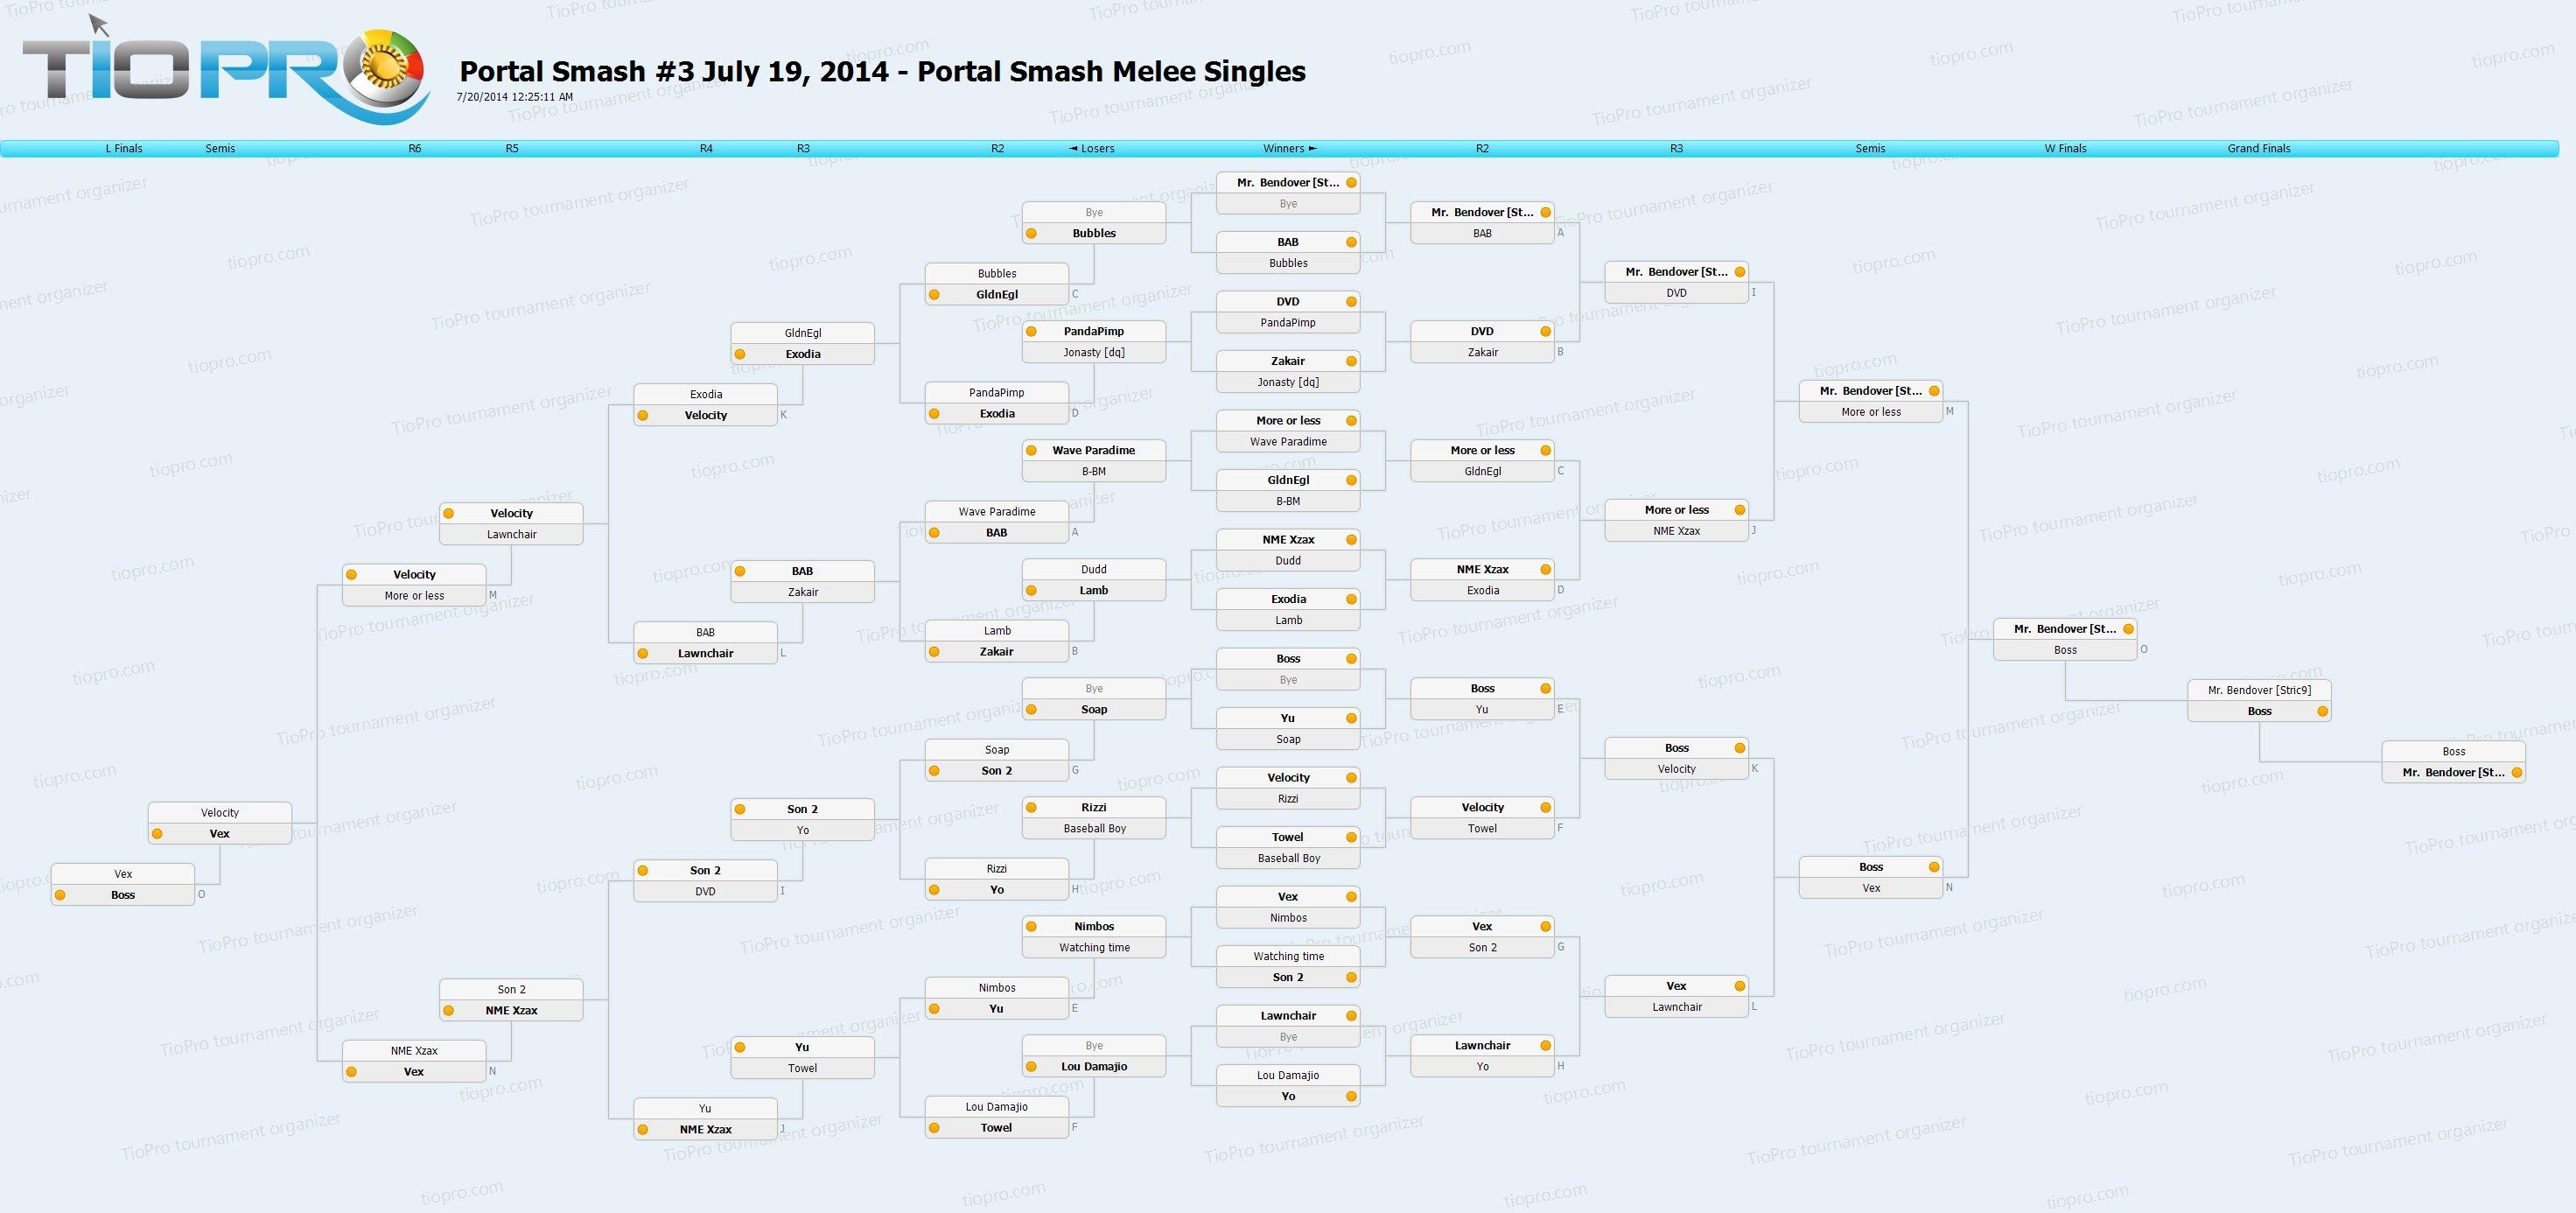 Portal Smash#3 Melee Singles